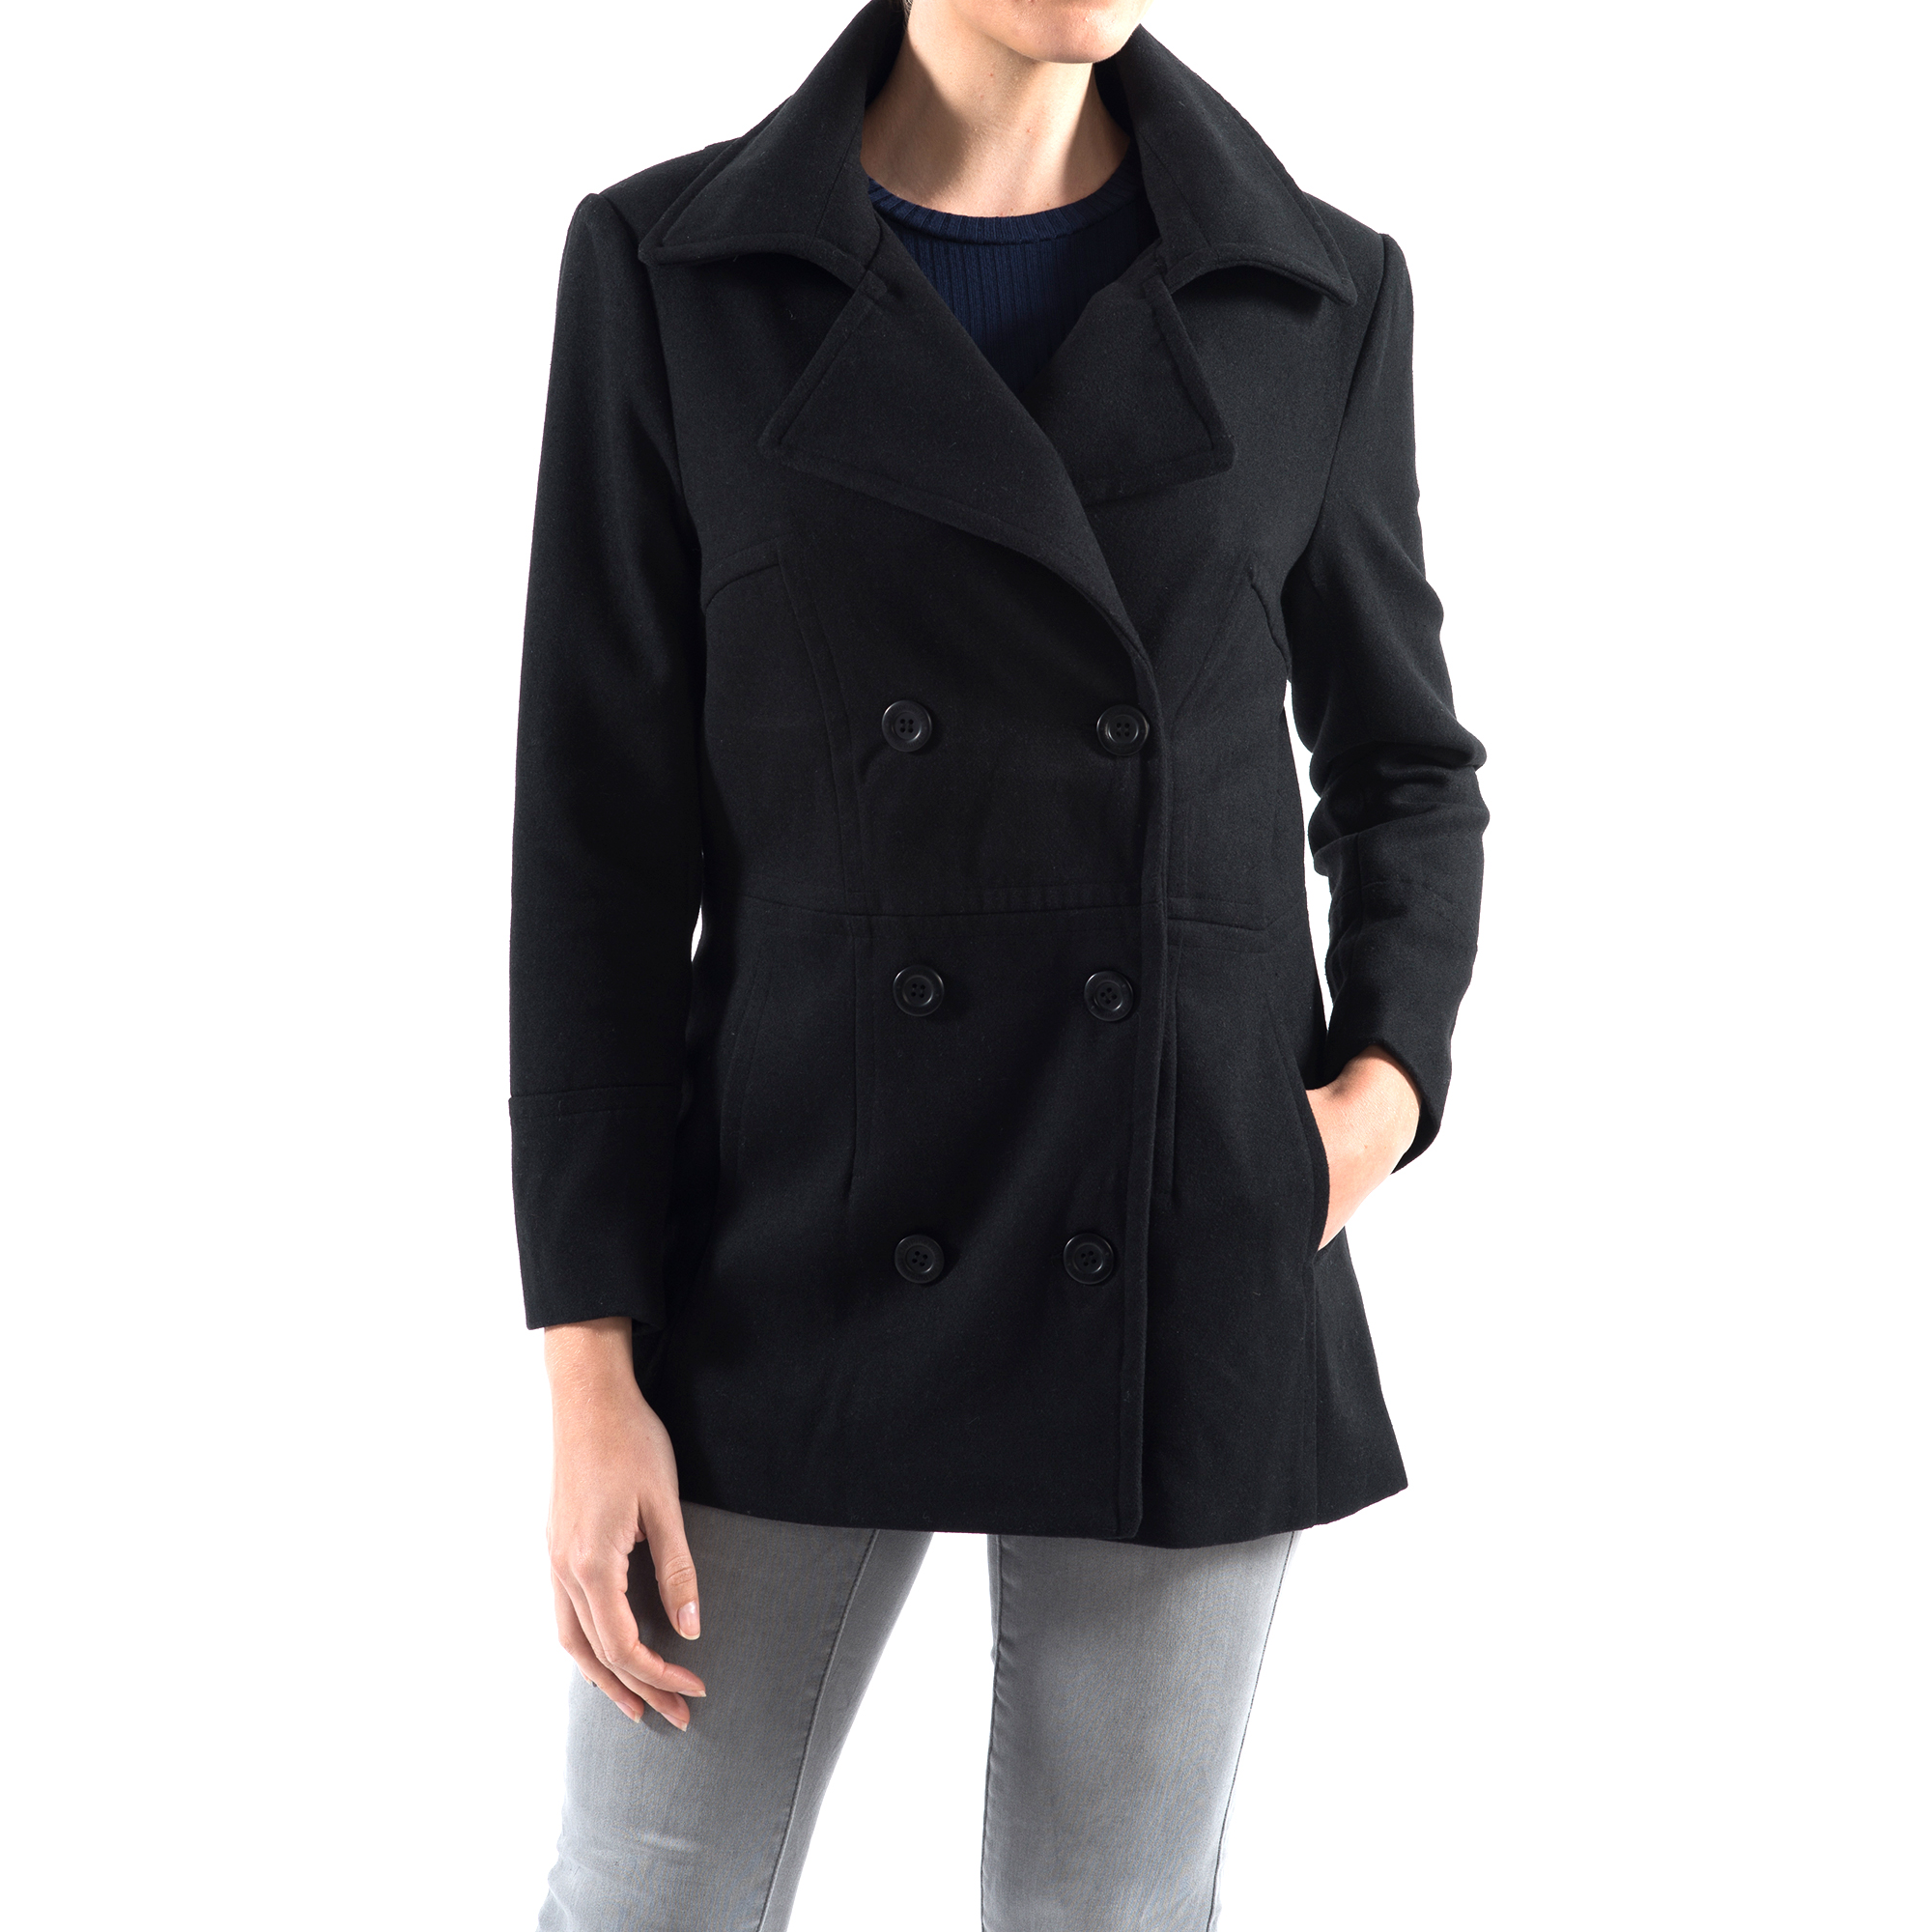 Alpine-Swiss-Emma-Womens-Peacoat-Jacket-Wool-Blazer-Double-Breasted-Overcoat-New thumbnail 21